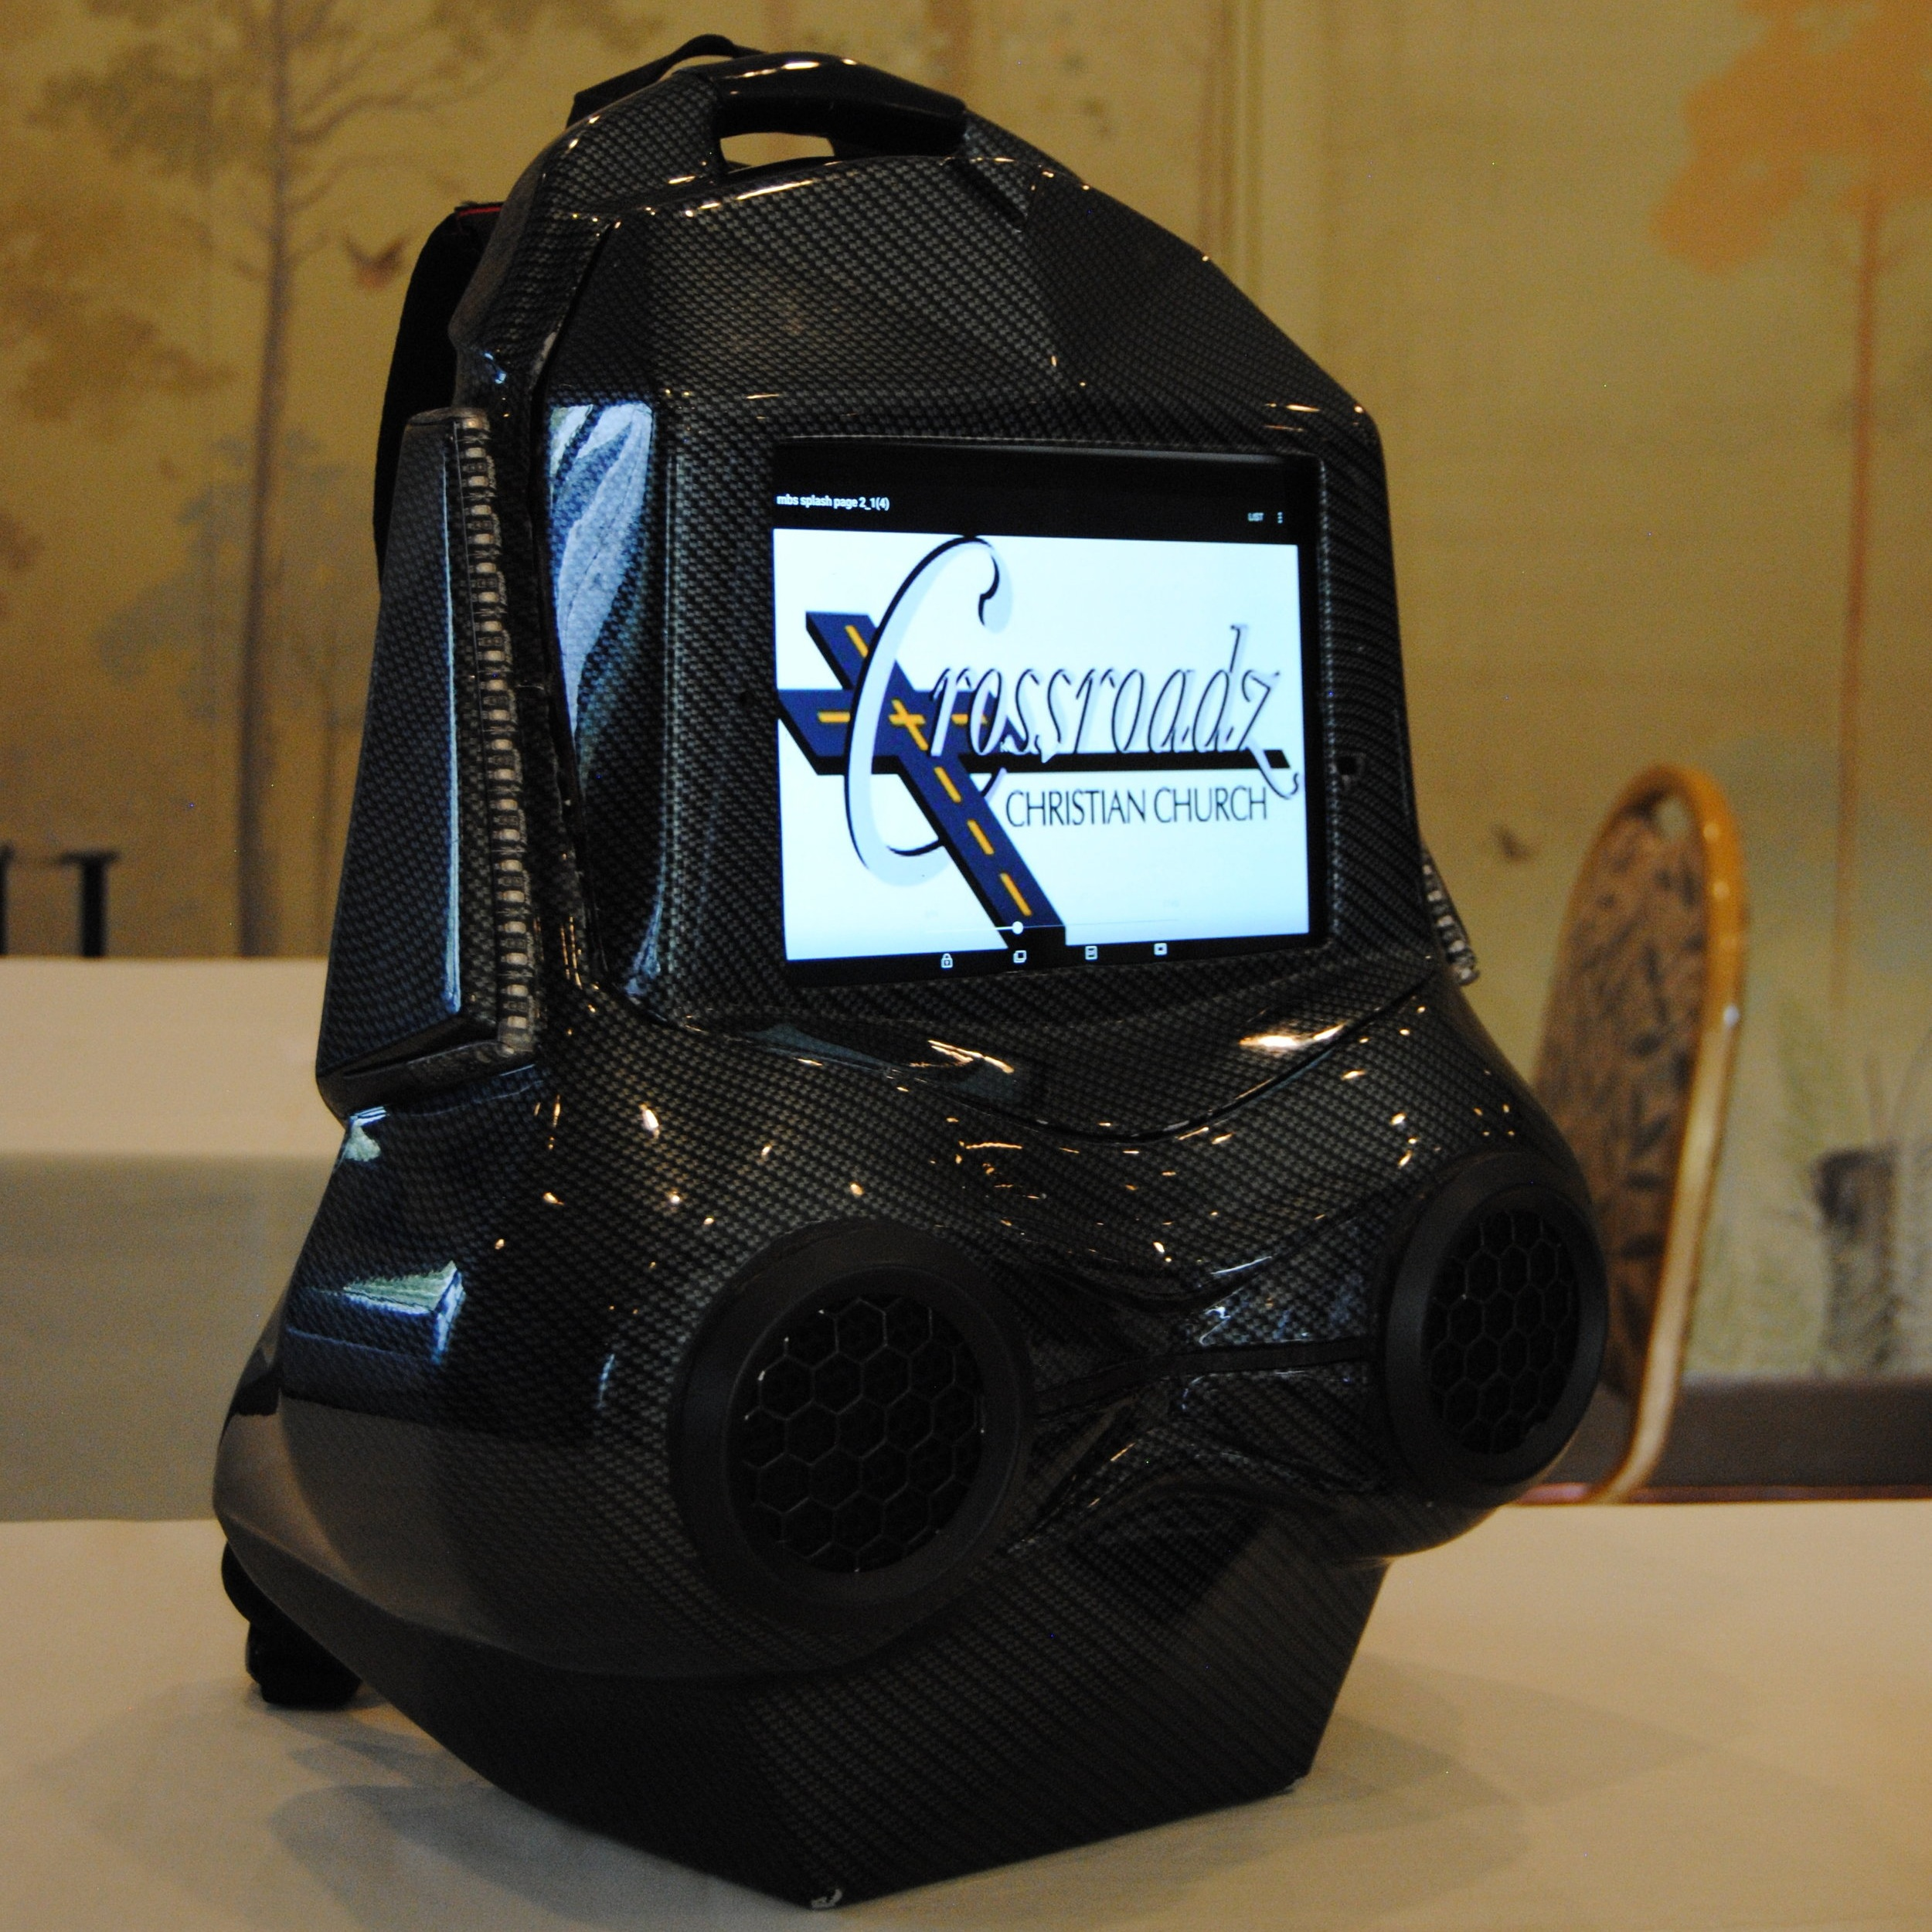 The MyBackStory backpack